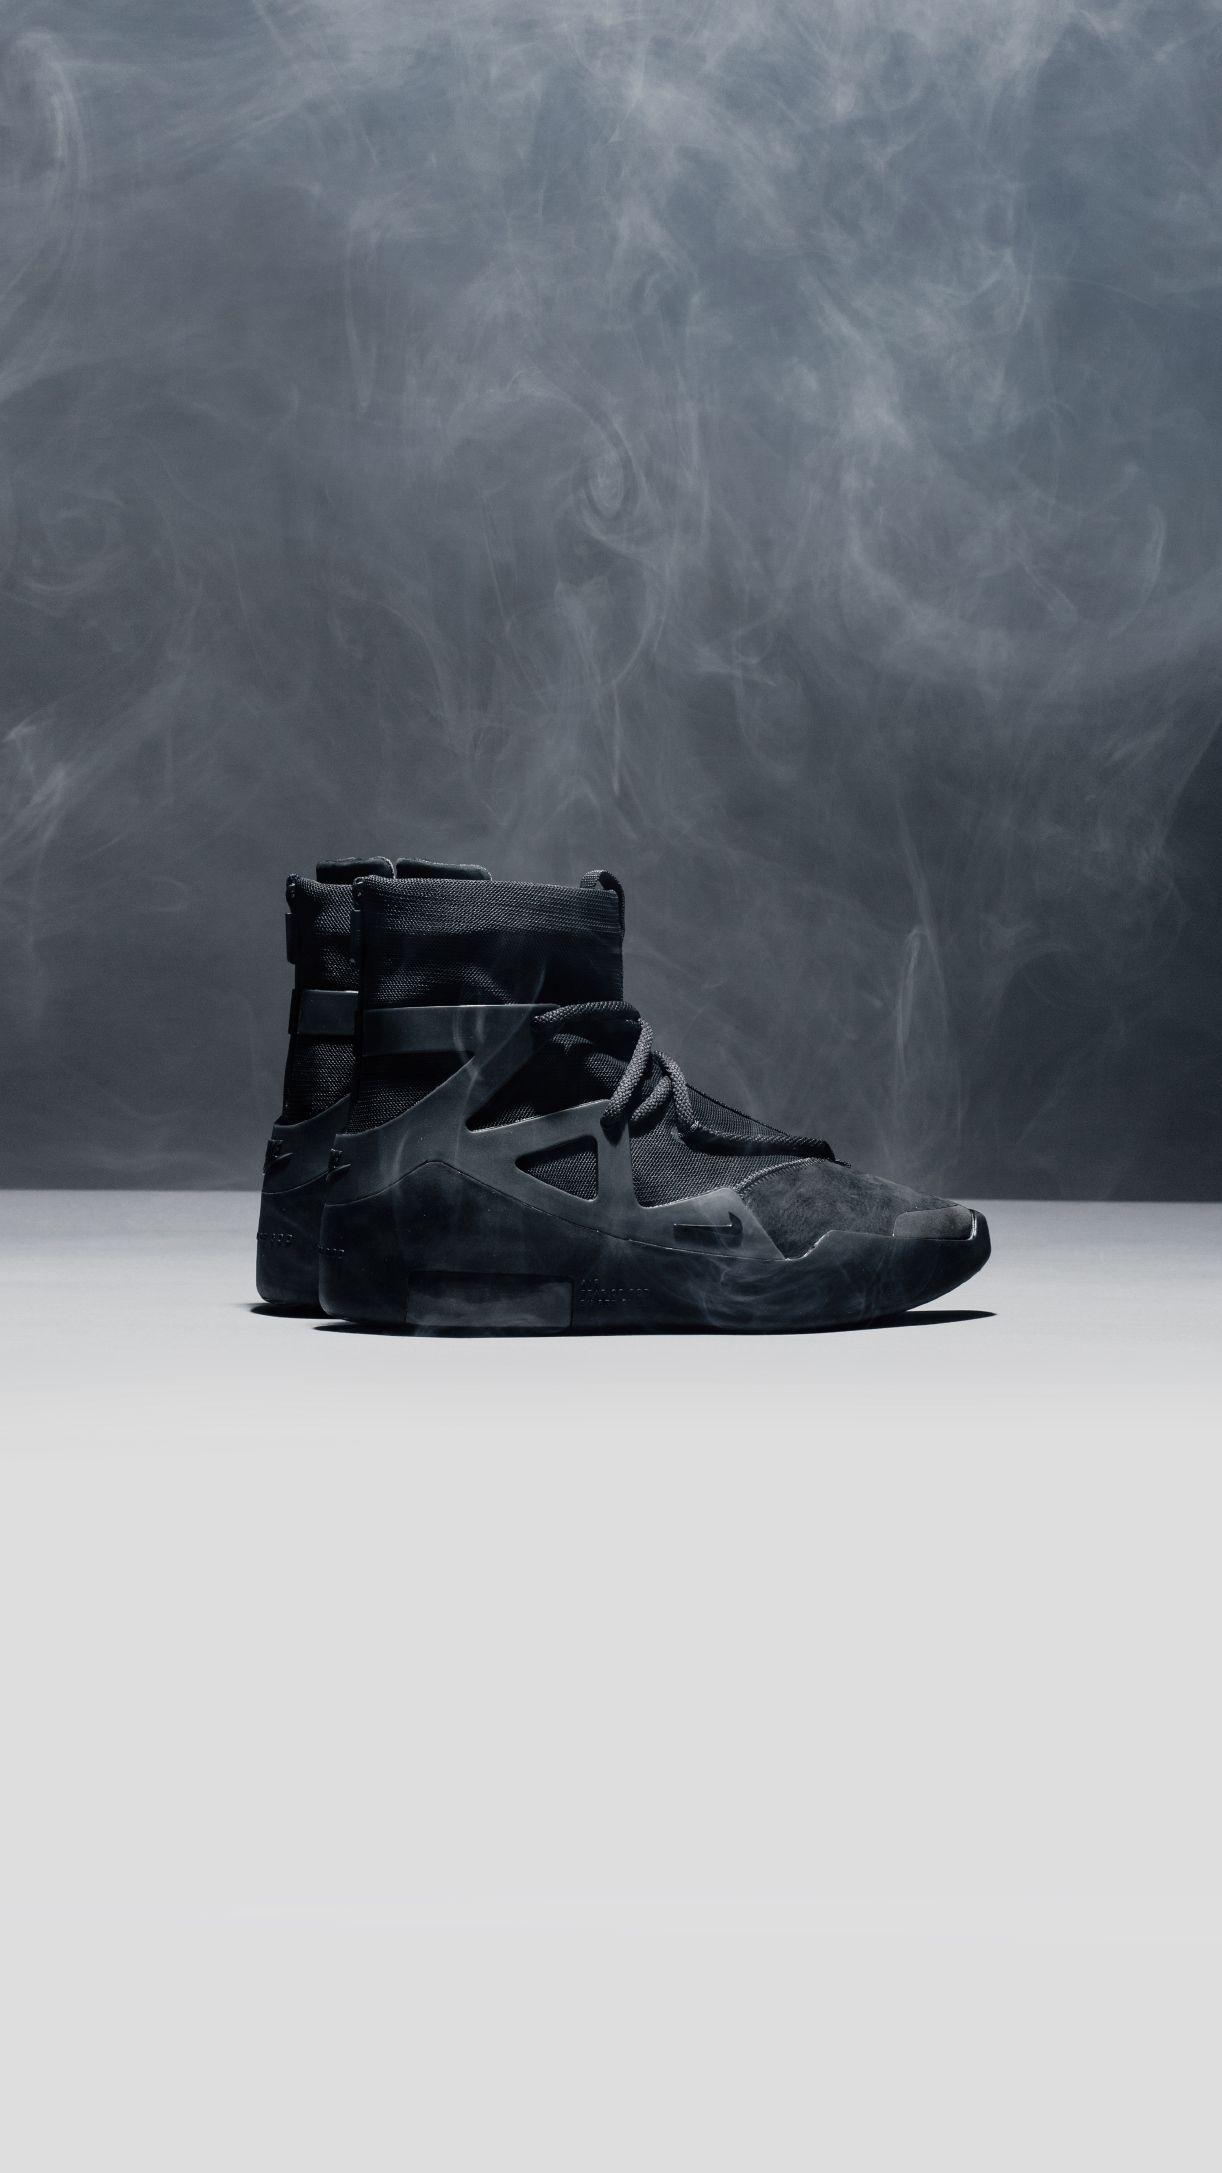 Tristemente exhaustivo Villano  Air Fear of God 1 'Triple Black' in 2020   Triple black, Shoe boots, Black